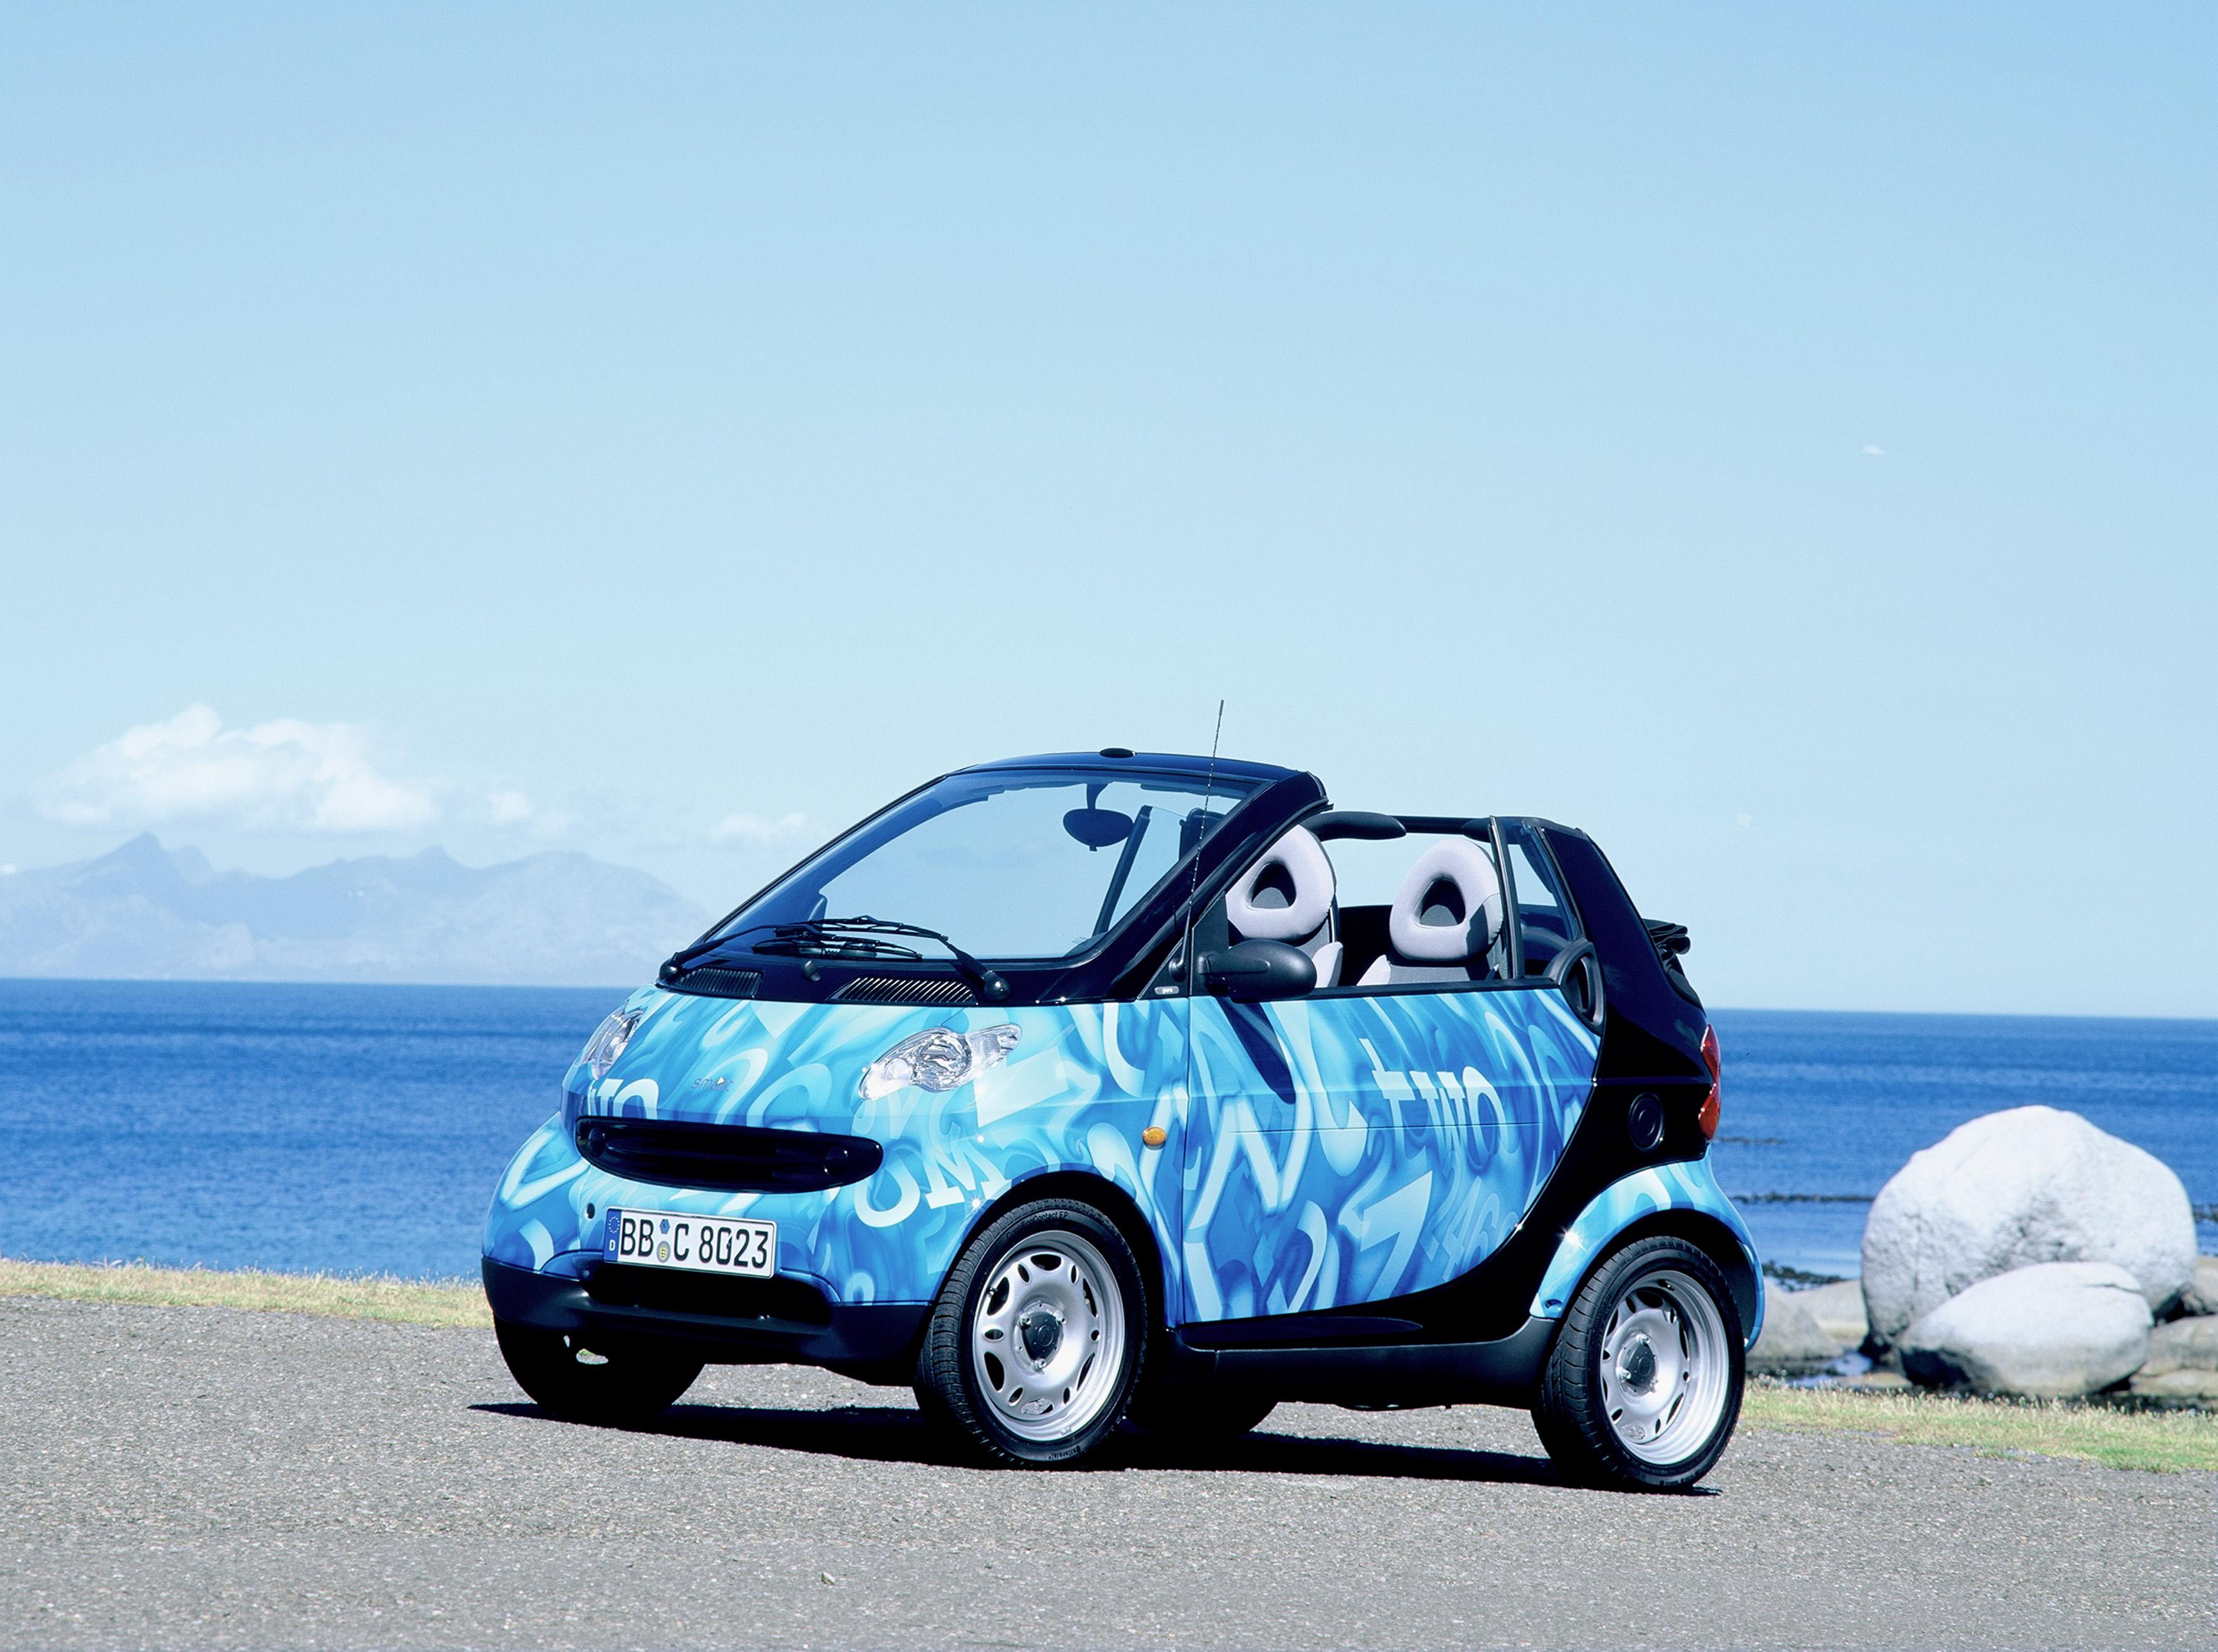 smart fortwo cabrio, 2001, erste Generation